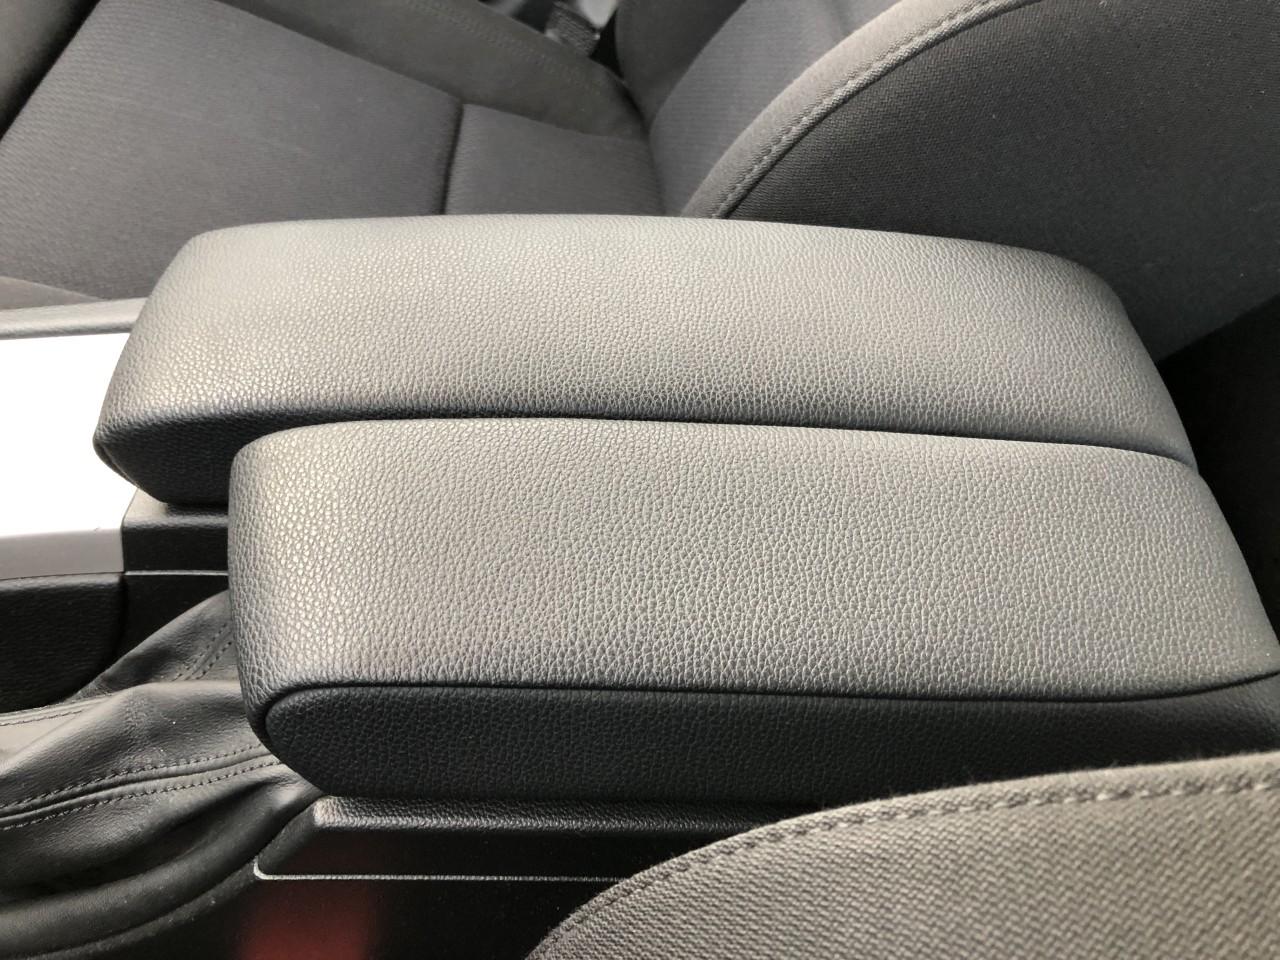 BMW 318 Diesel / Automata / Keyless Go-Entry / Bi-XENON / Navi MARE / Interior M (volan si scaune) / Camera faza scurta-lunga / Senzori parcare fata-spate / Scaune incalzite / RECENT ADUSA DIN GERMANIA!!! 2010